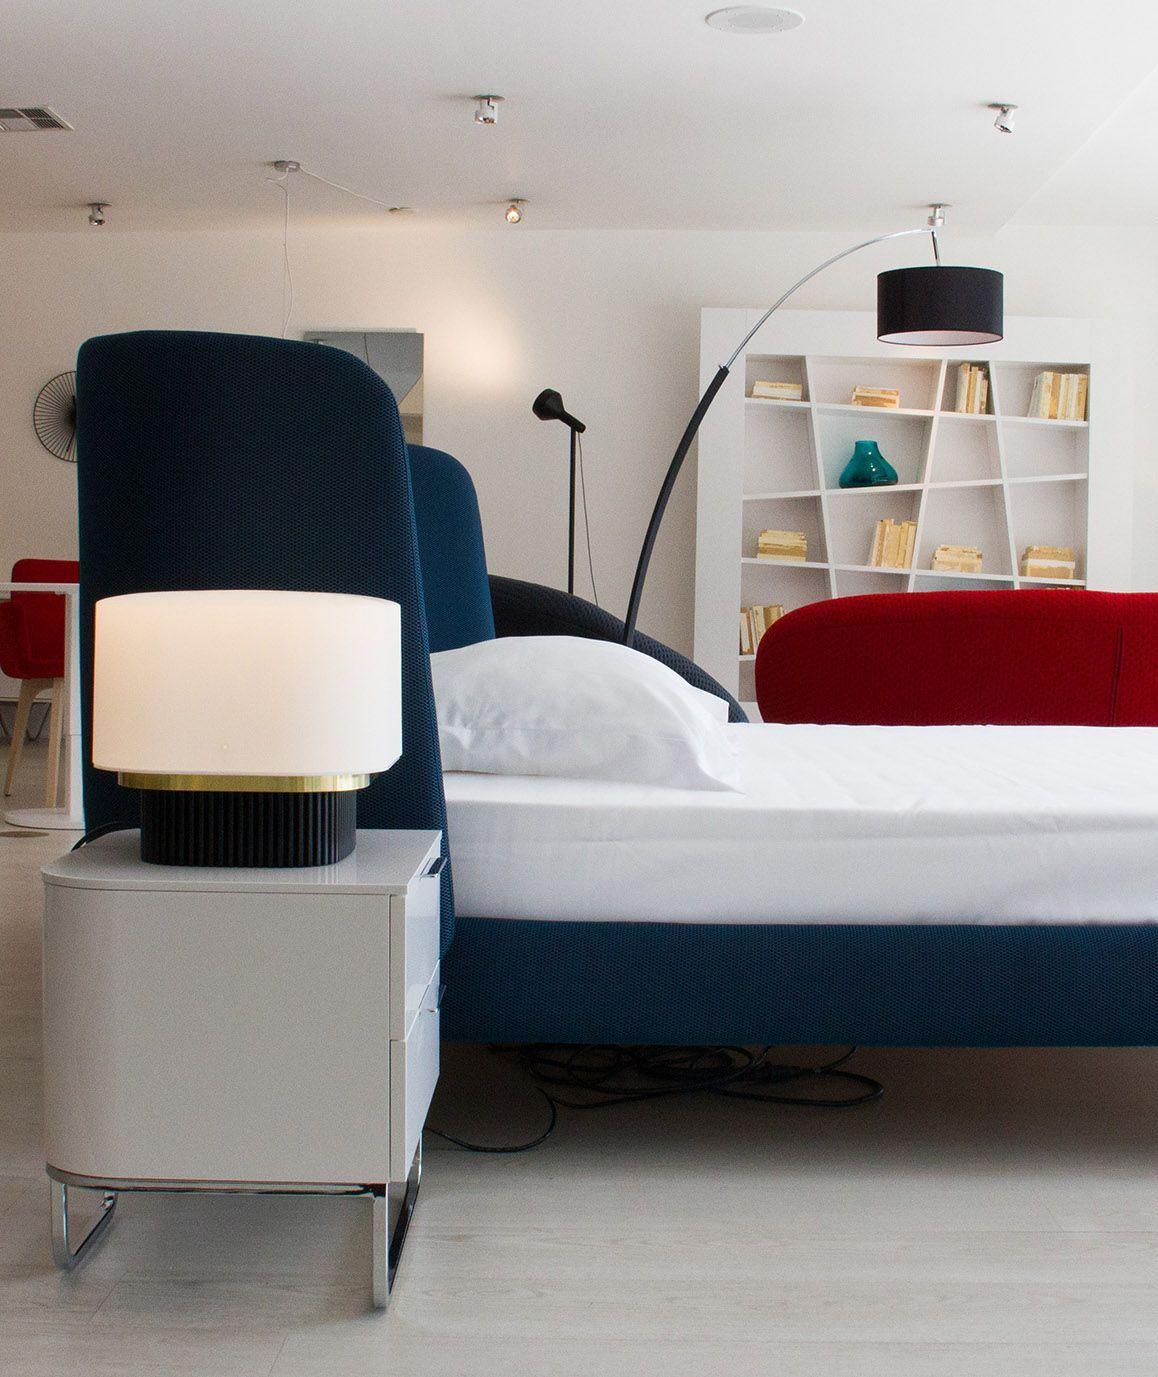 Desdemone Bed Designed By Soda Designers Nasrallah Horner Info Linea Inc Com Bed Design Bed Bedroom Inspirations